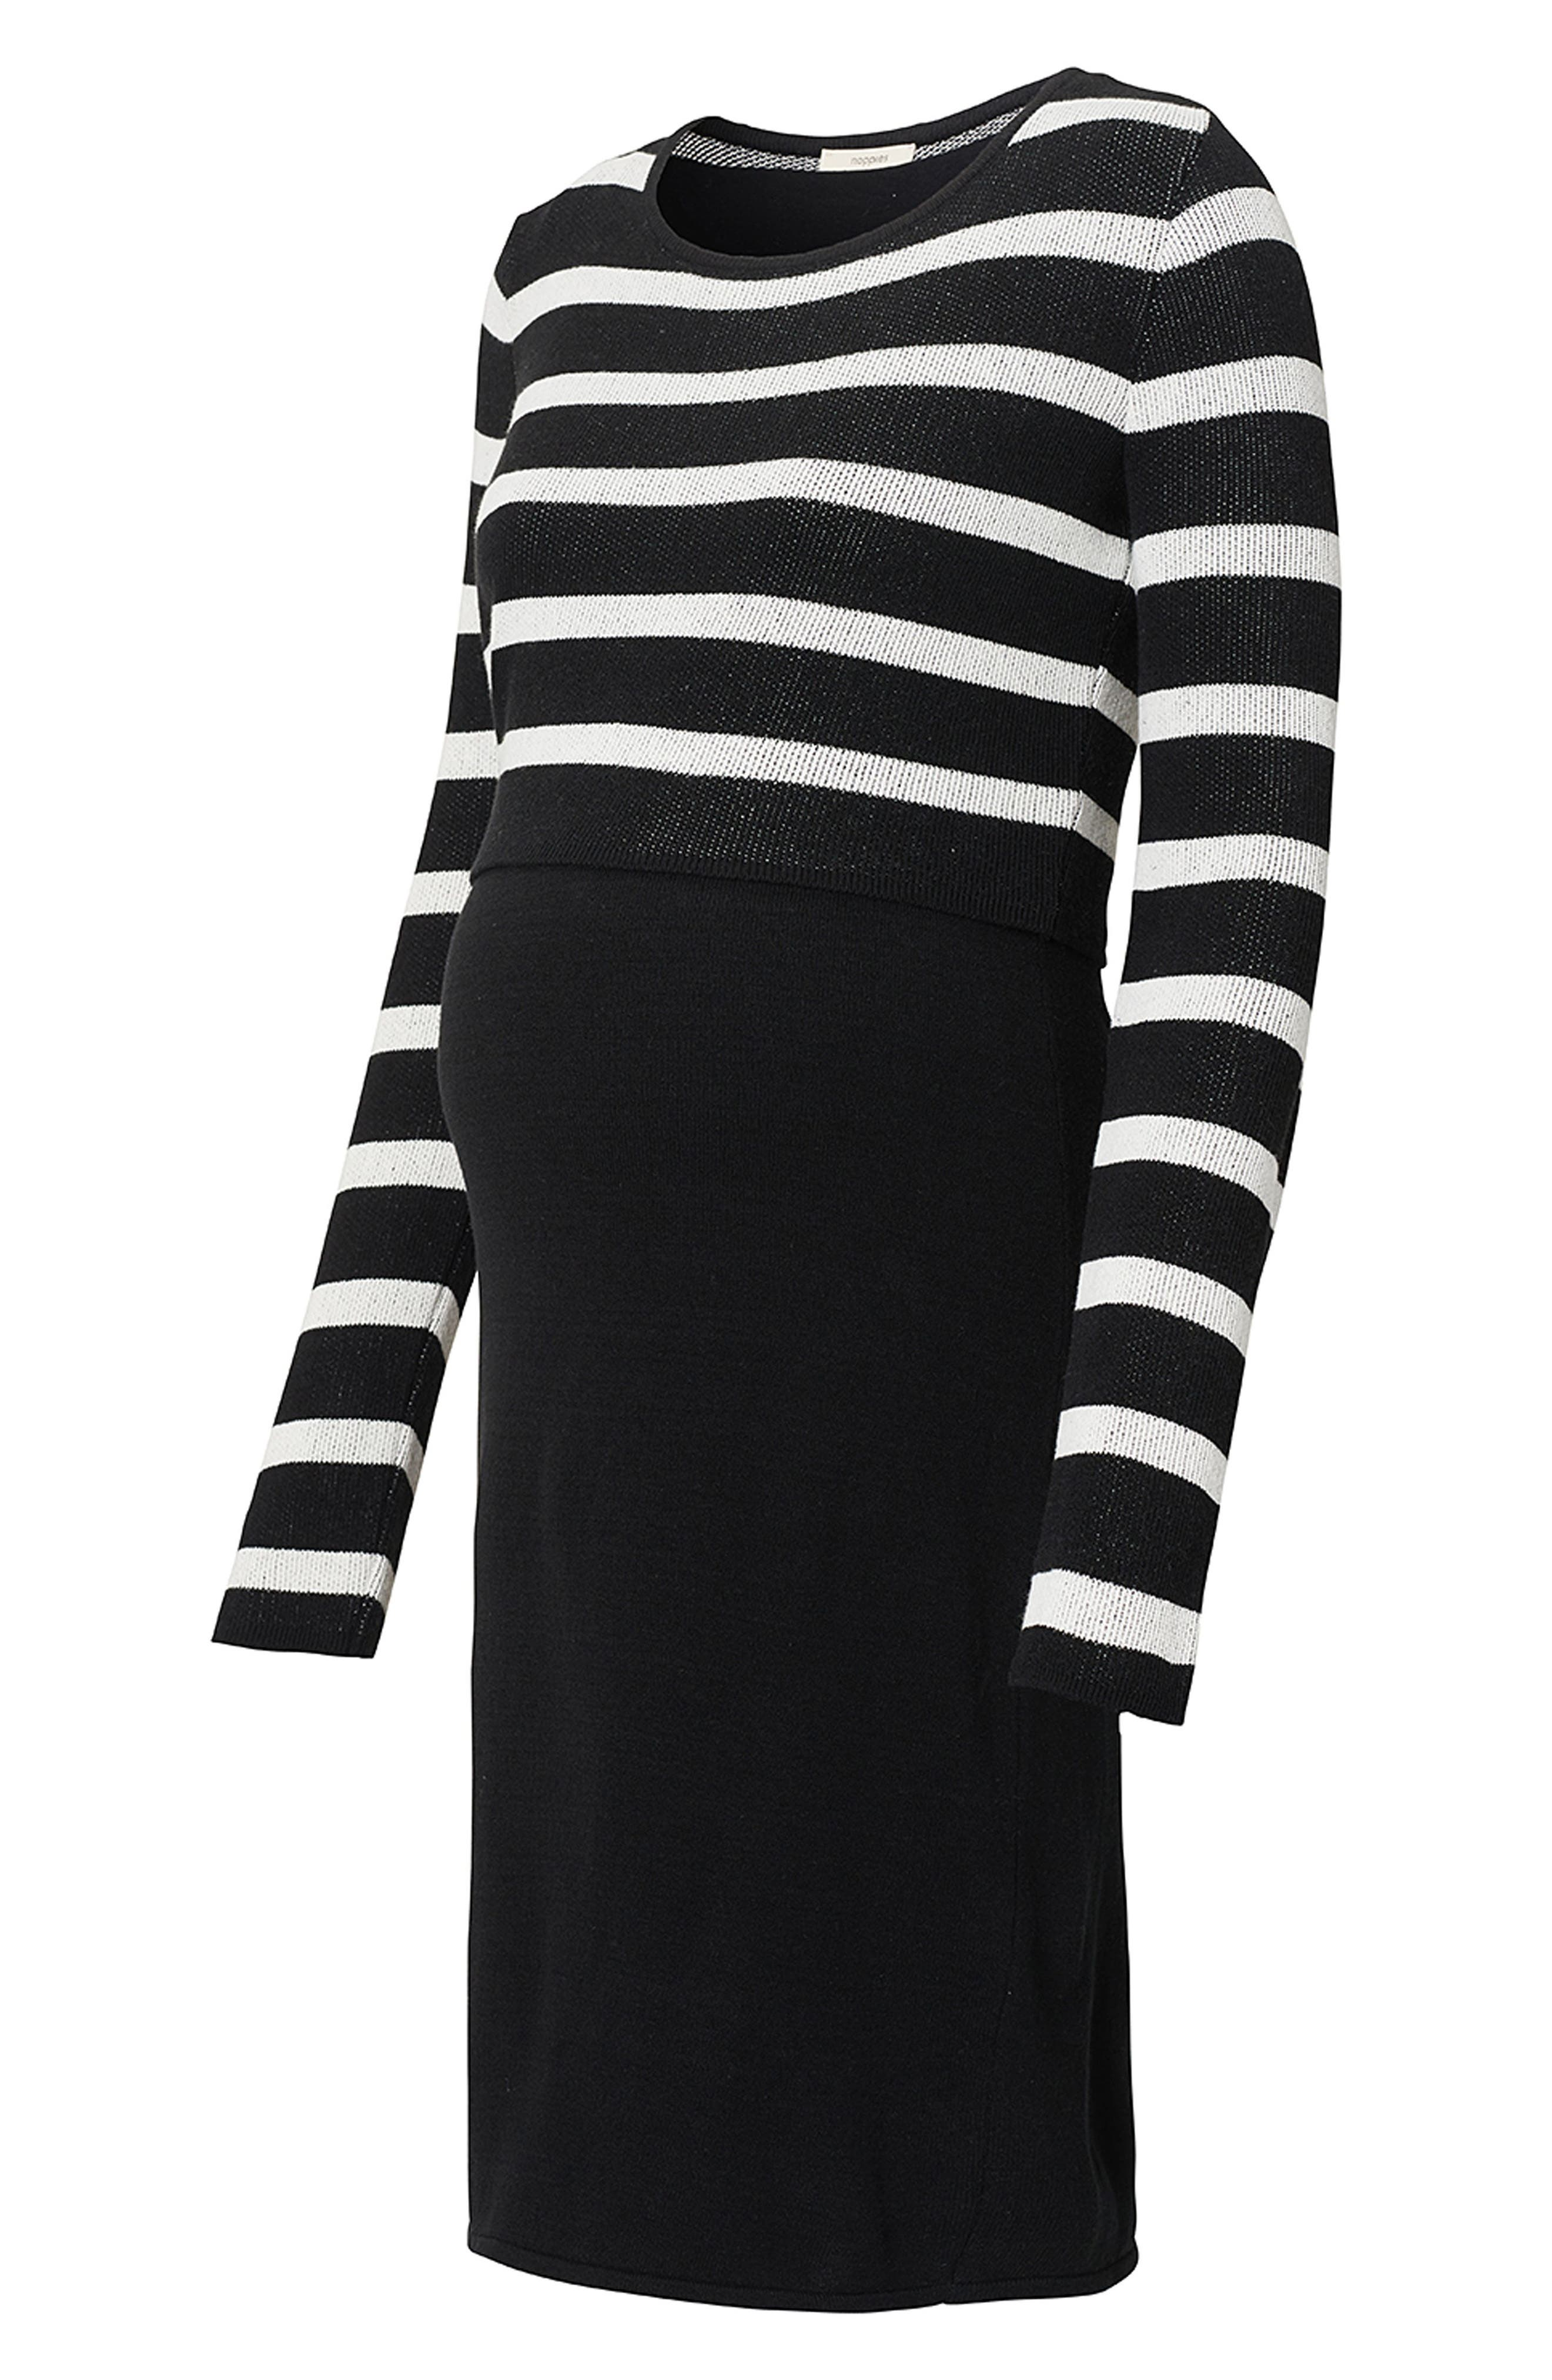 Imara Nursing/Maternity Dress,                             Alternate thumbnail 3, color,                             BLACK